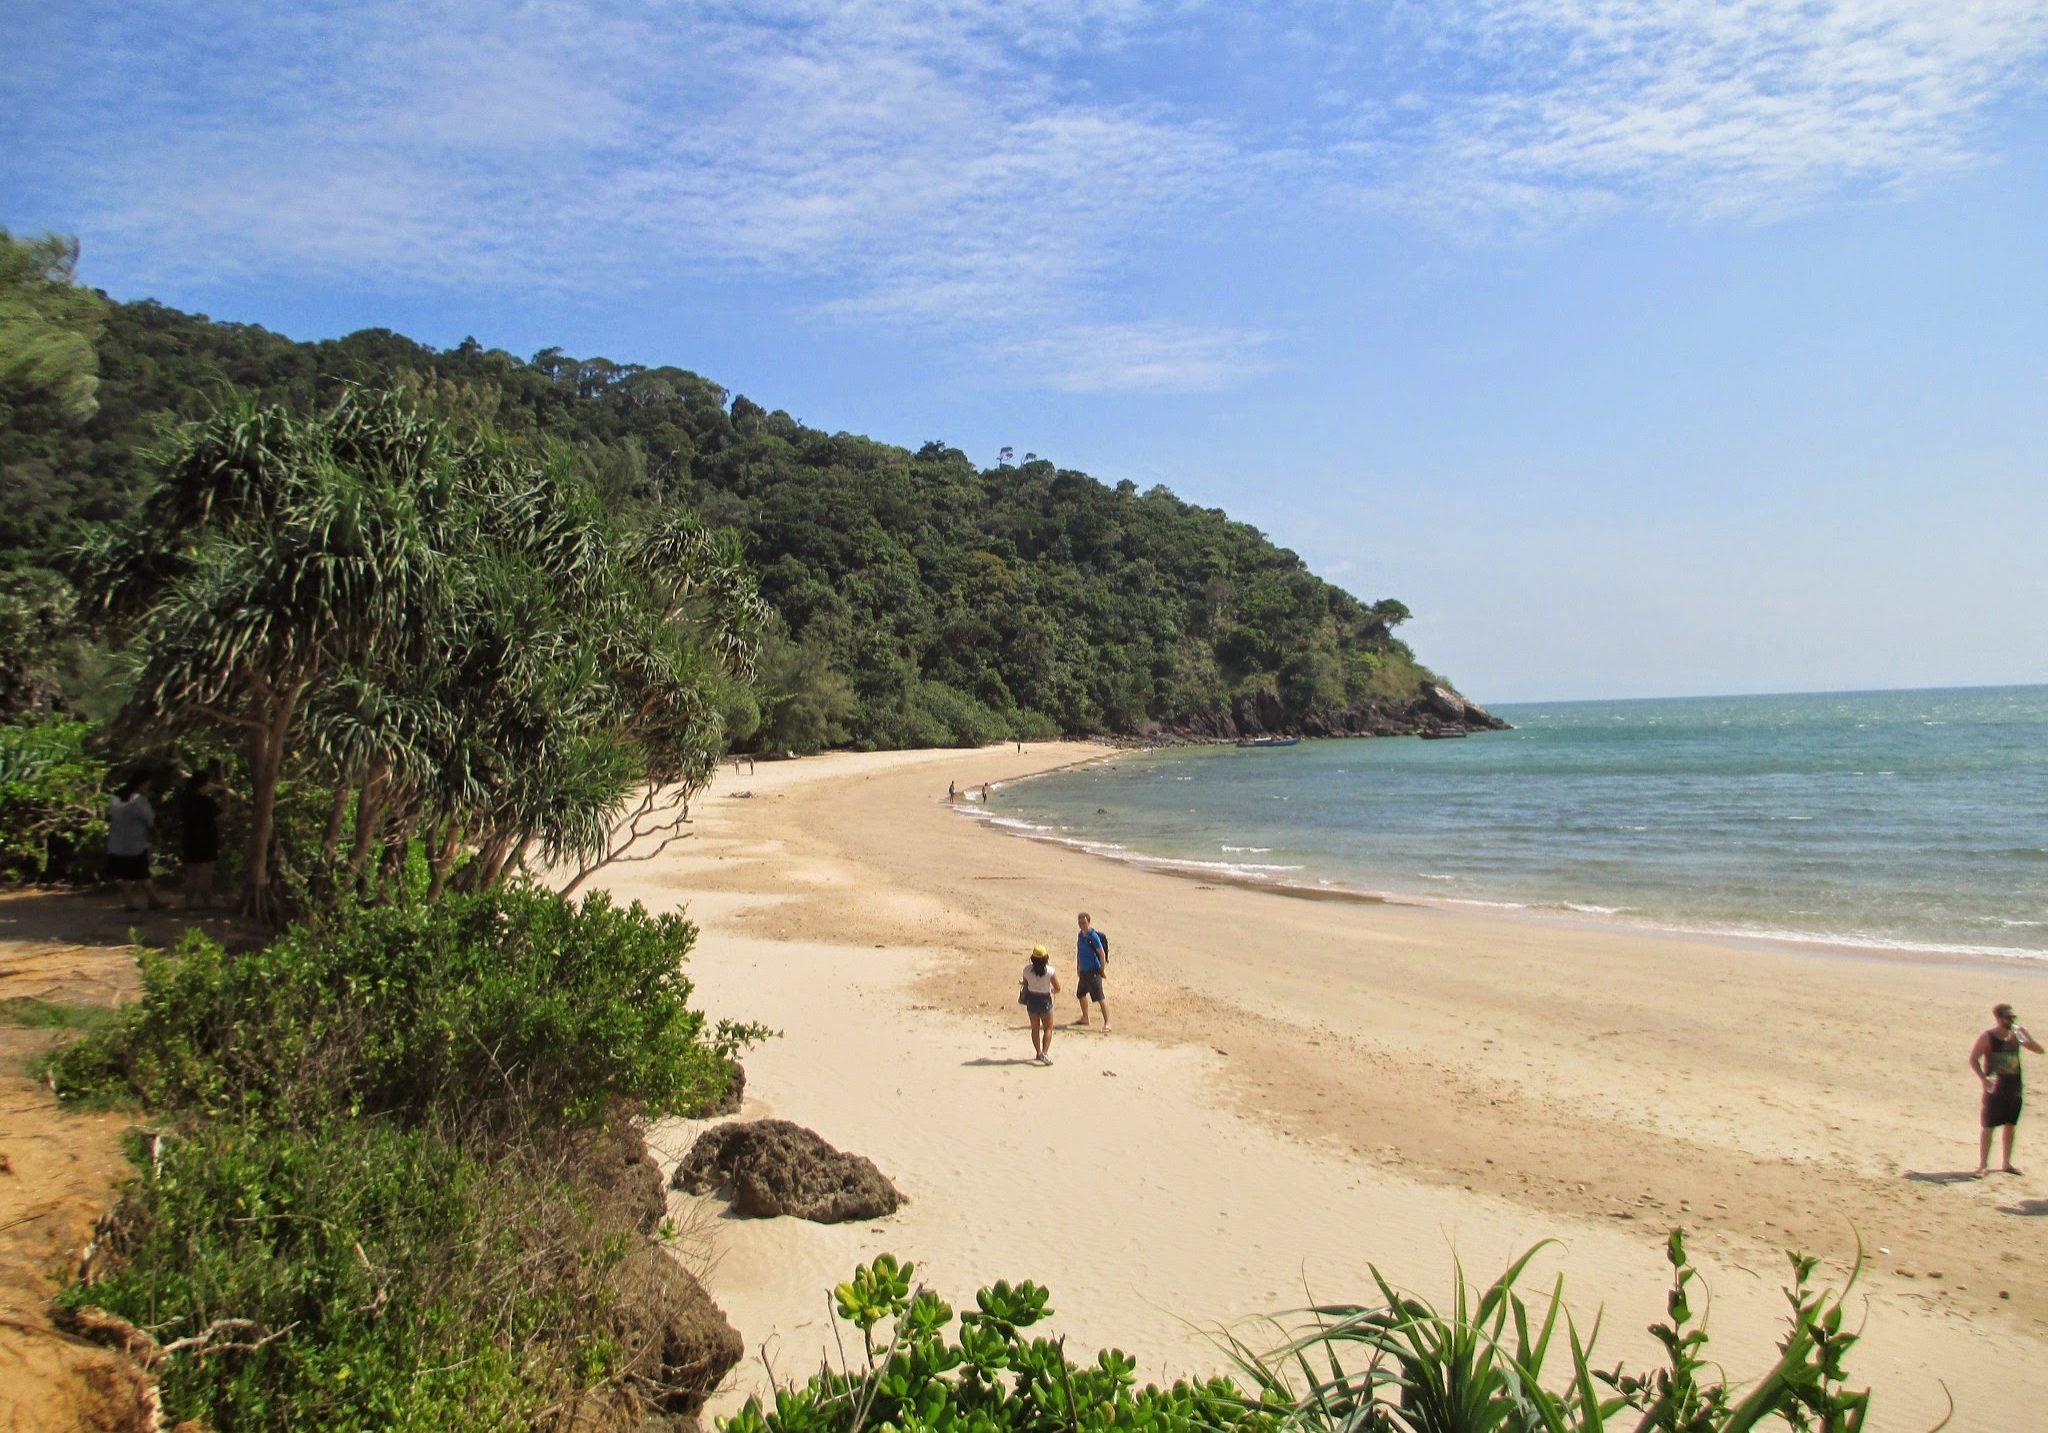 Koh Lanta, nationals park, beach, island, thailand, paradise, travelling, travels, backpacking,